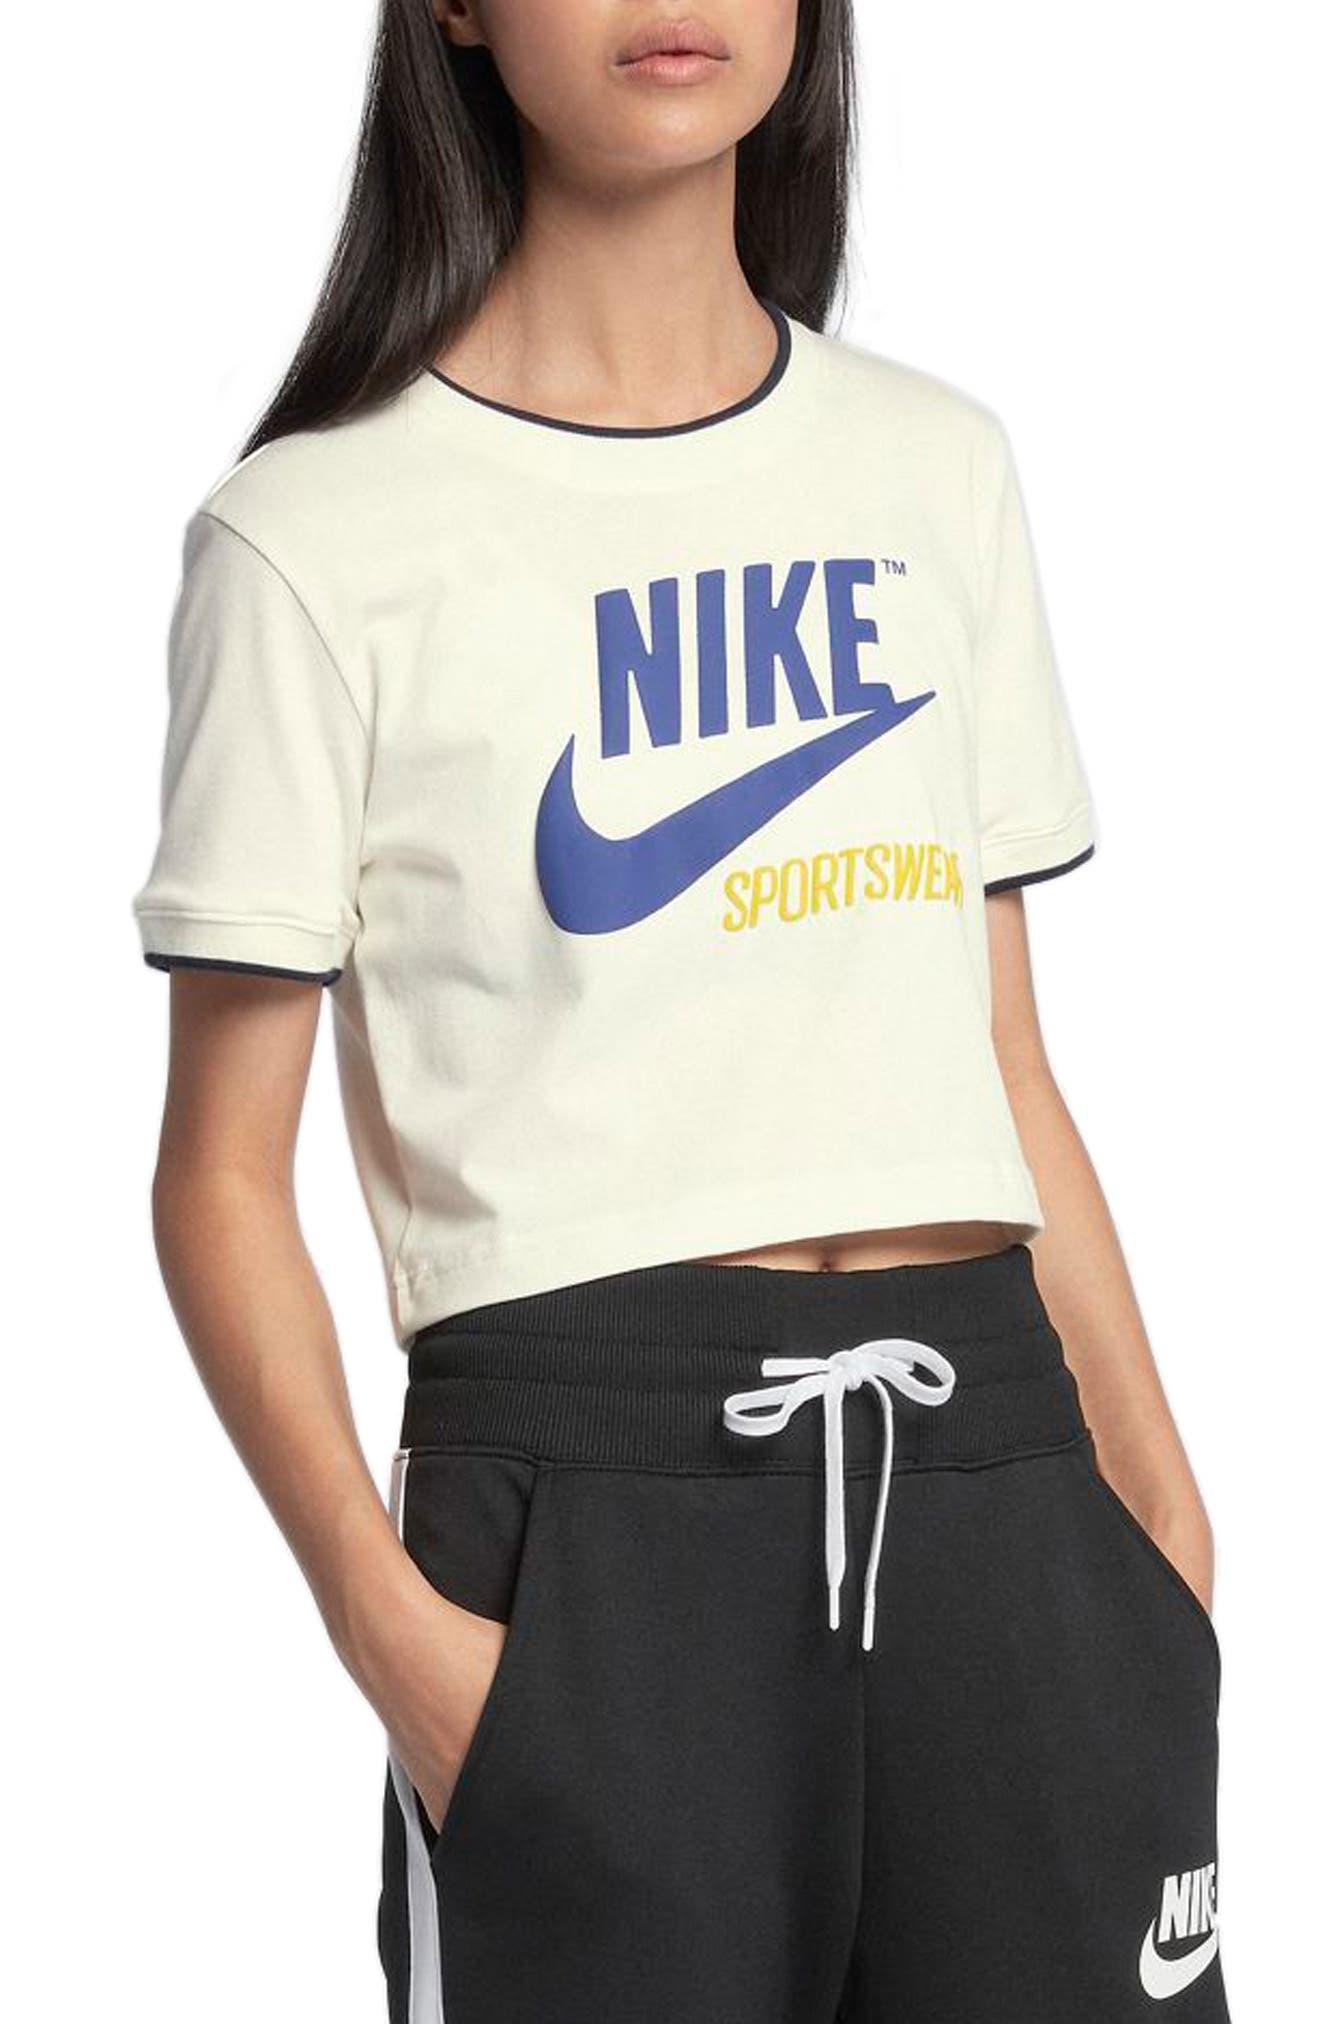 Sportswear Crop Top,                             Main thumbnail 1, color,                             Sail